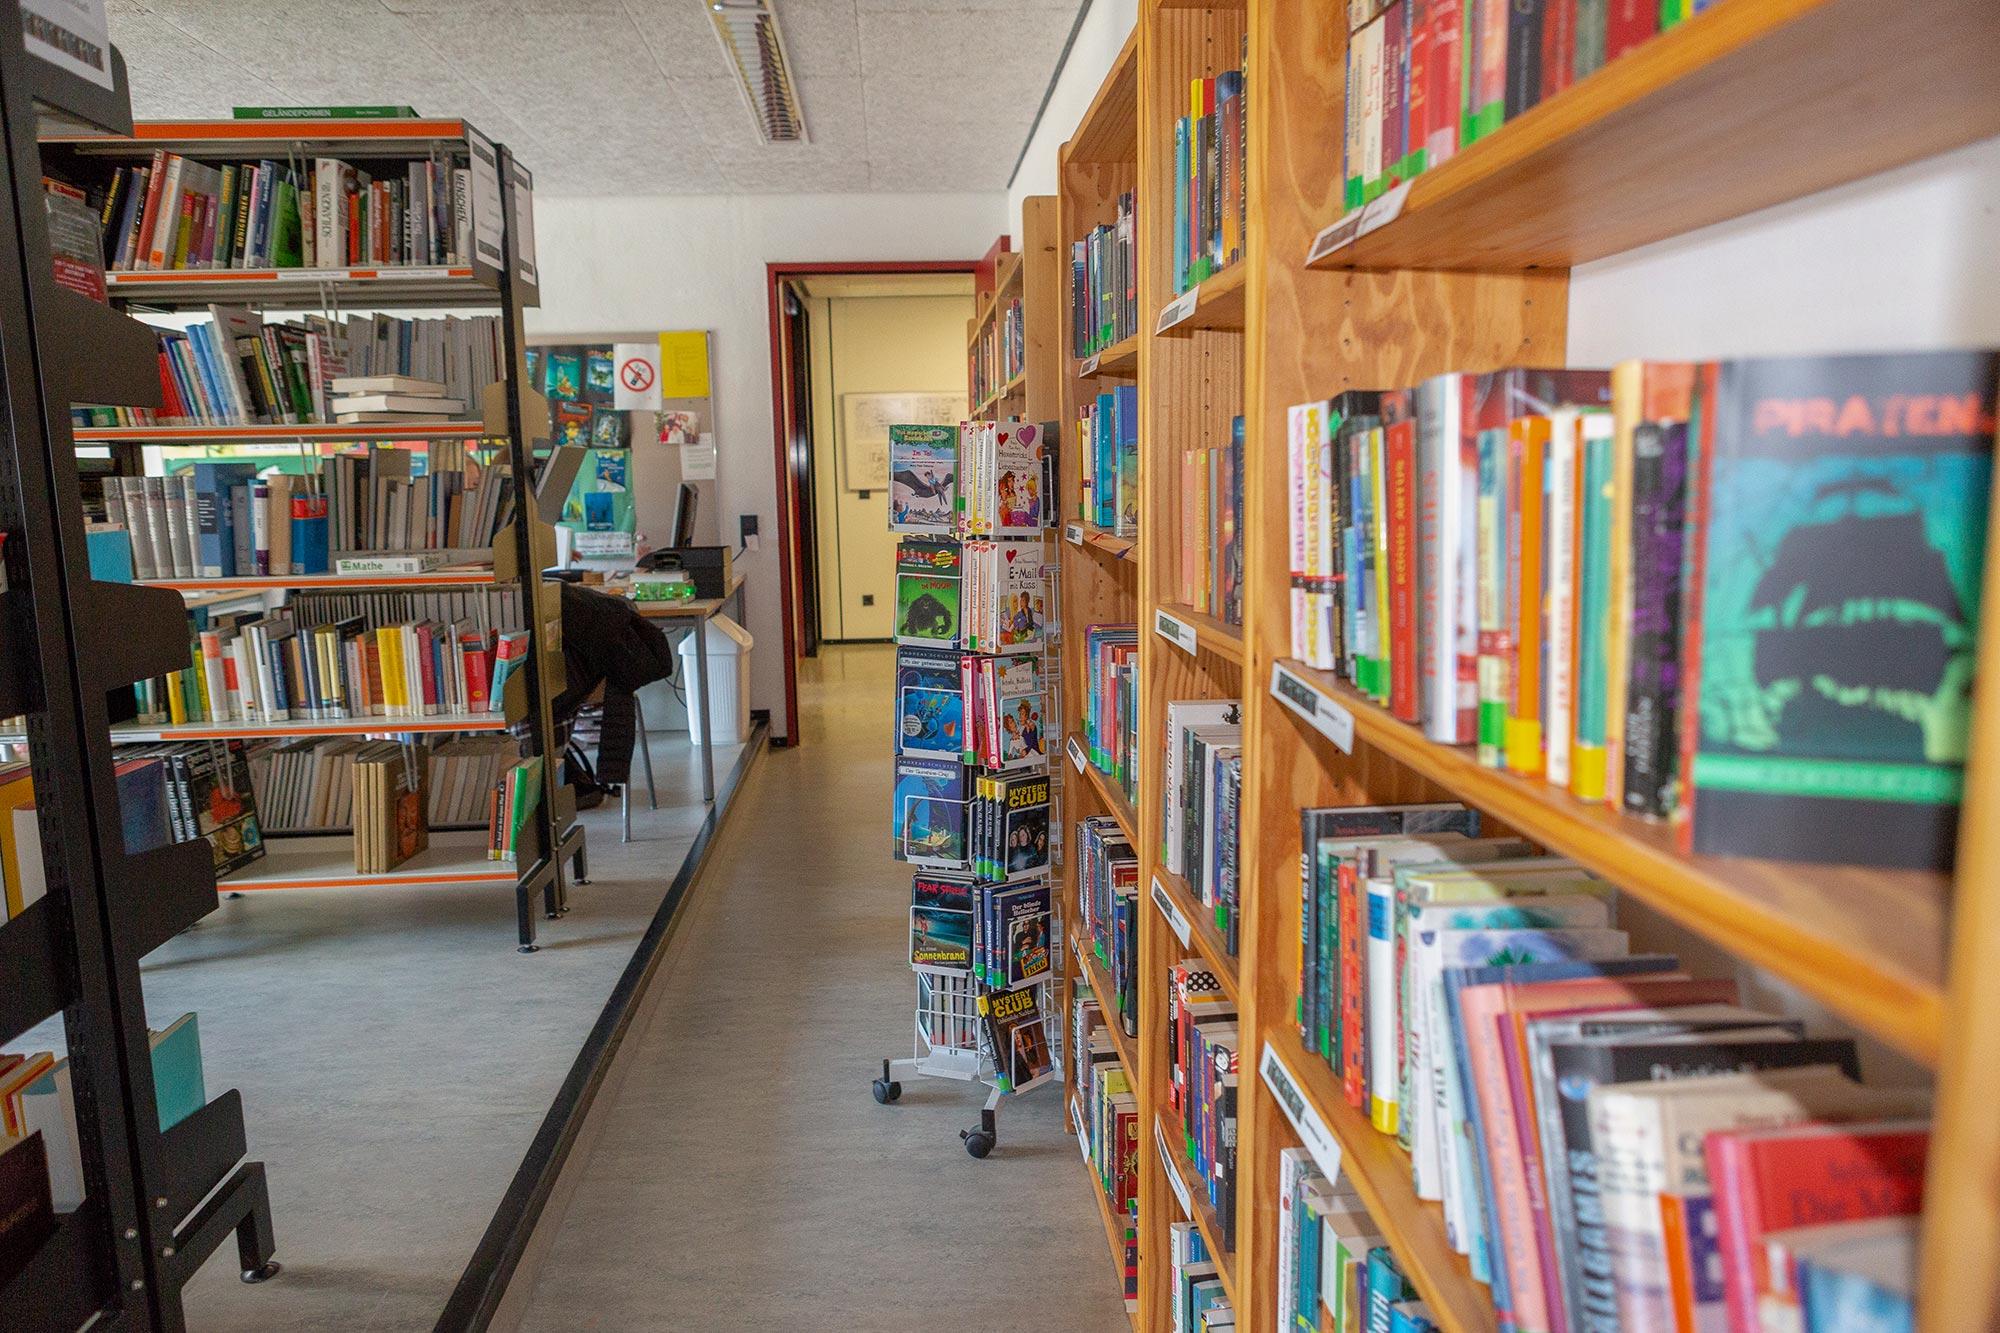 Schülerbücherei_Bild5